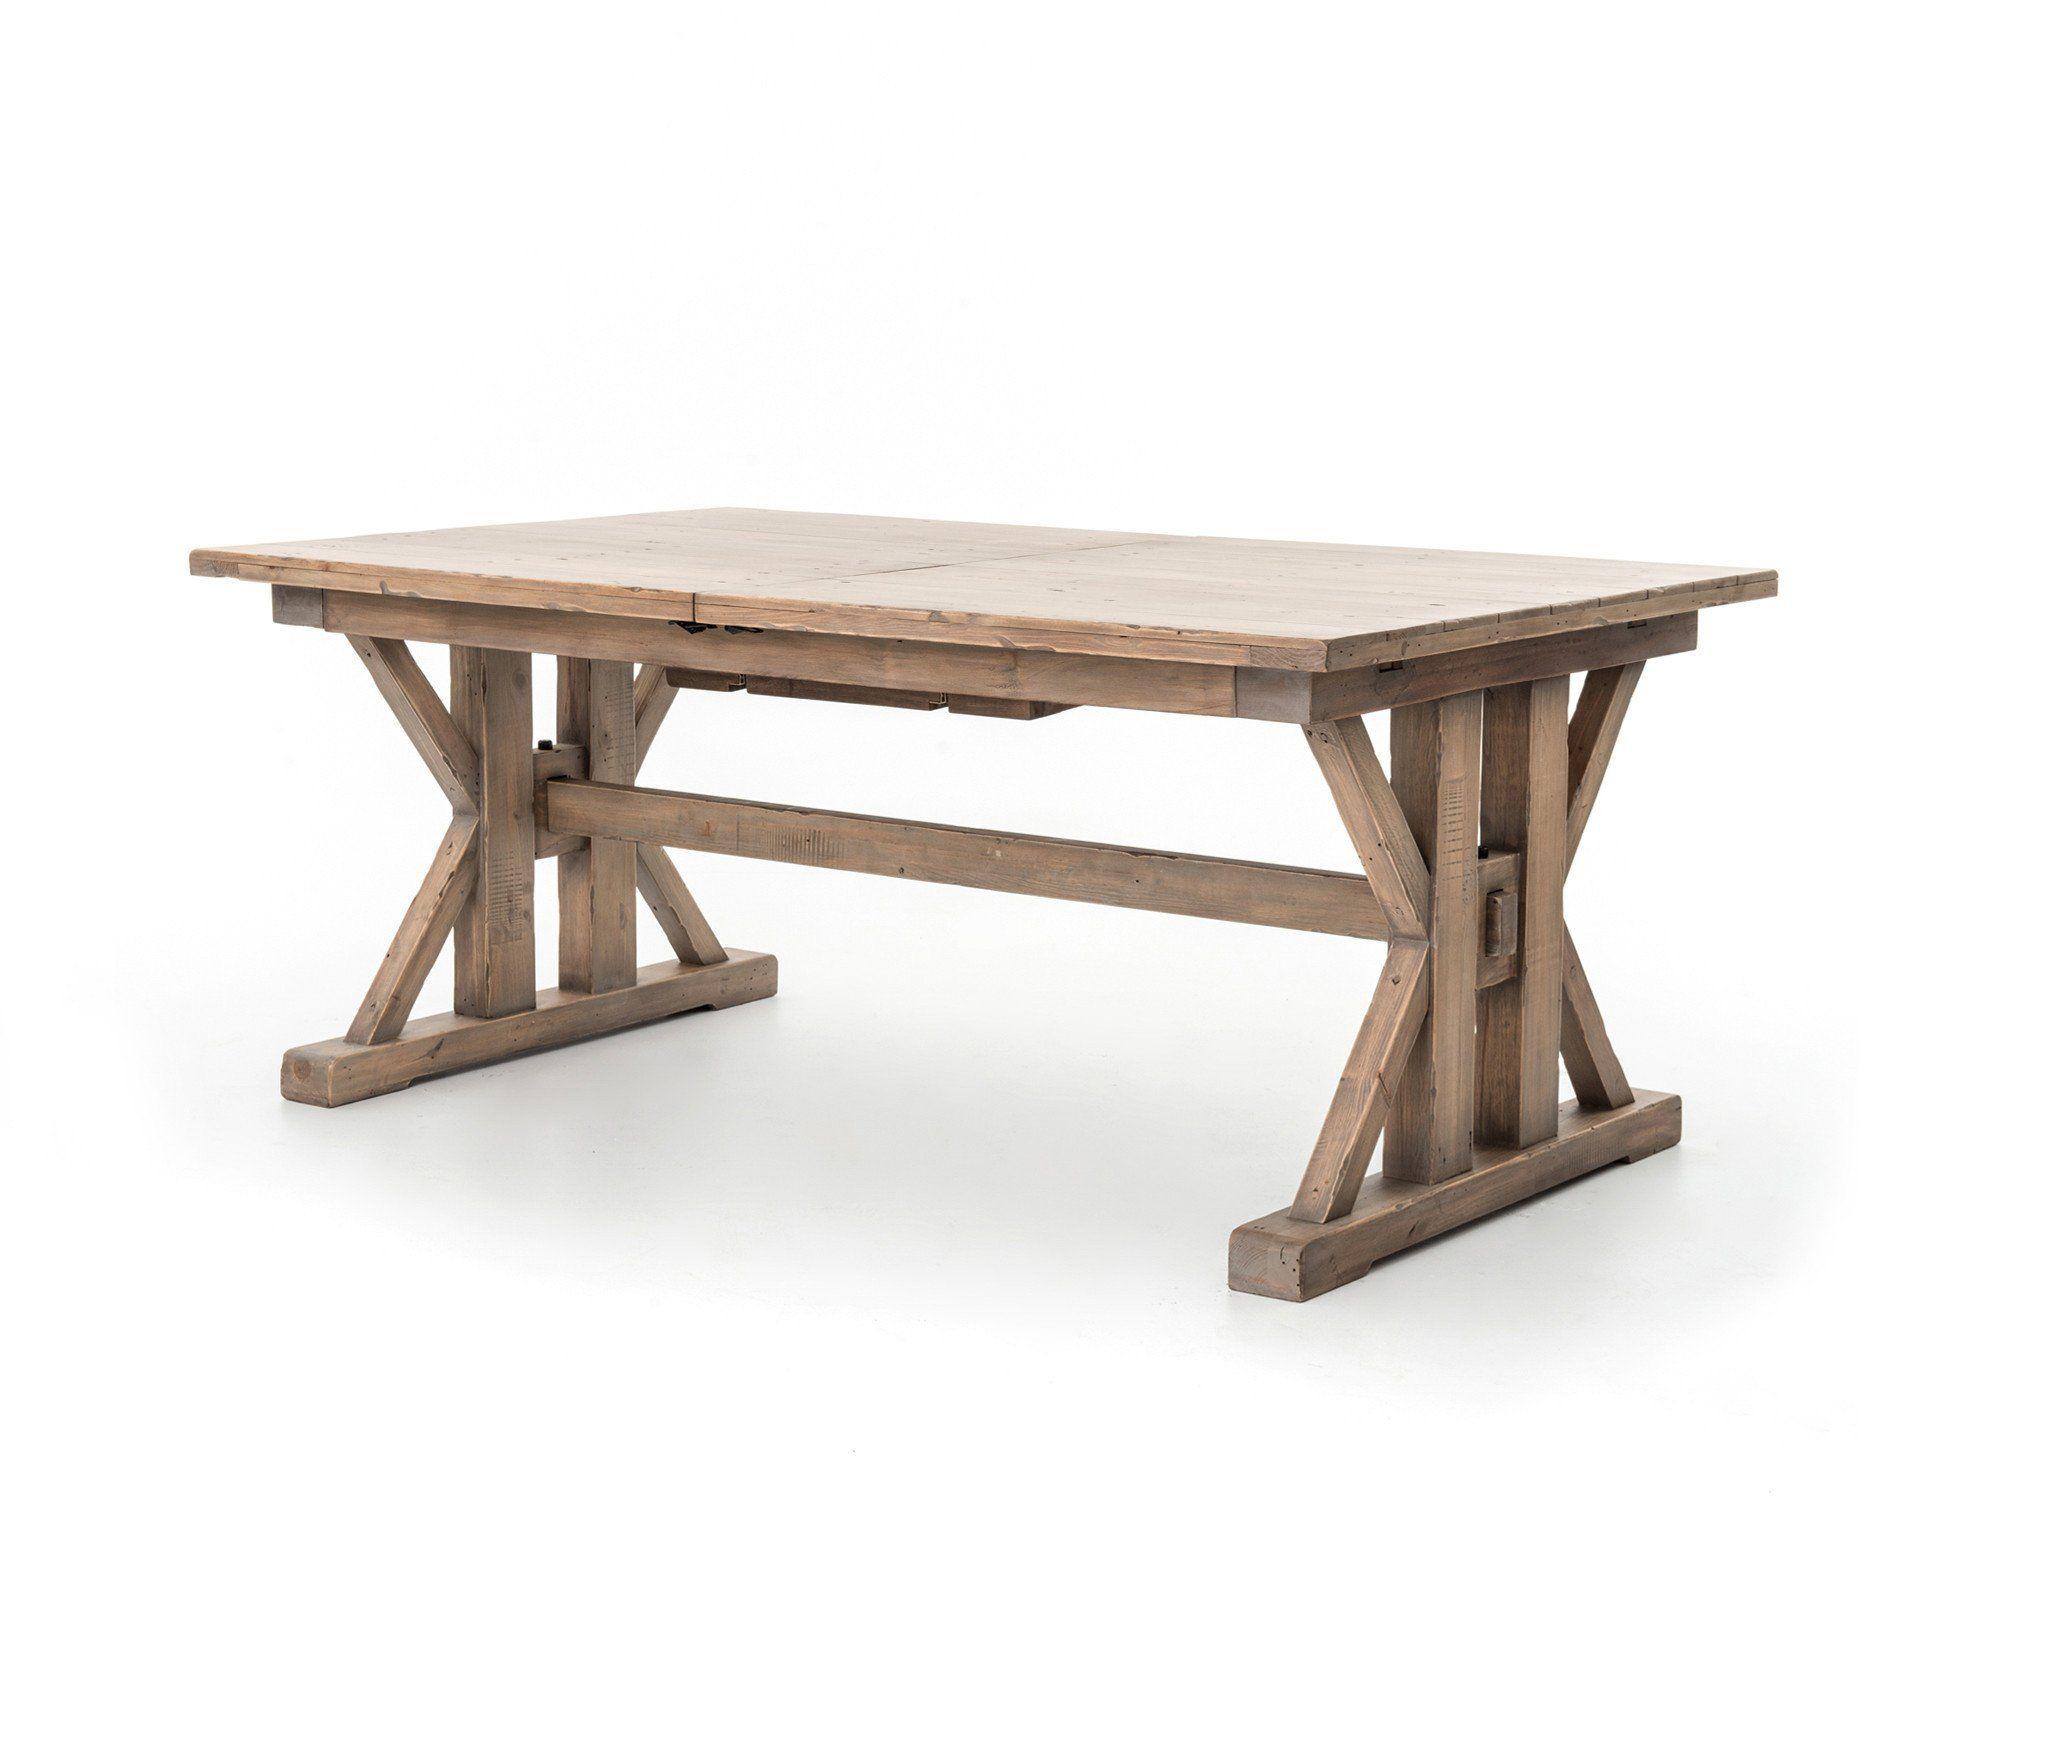 darius ext dining tbl 72 96 sun table ideas extension dining rh pinterest com